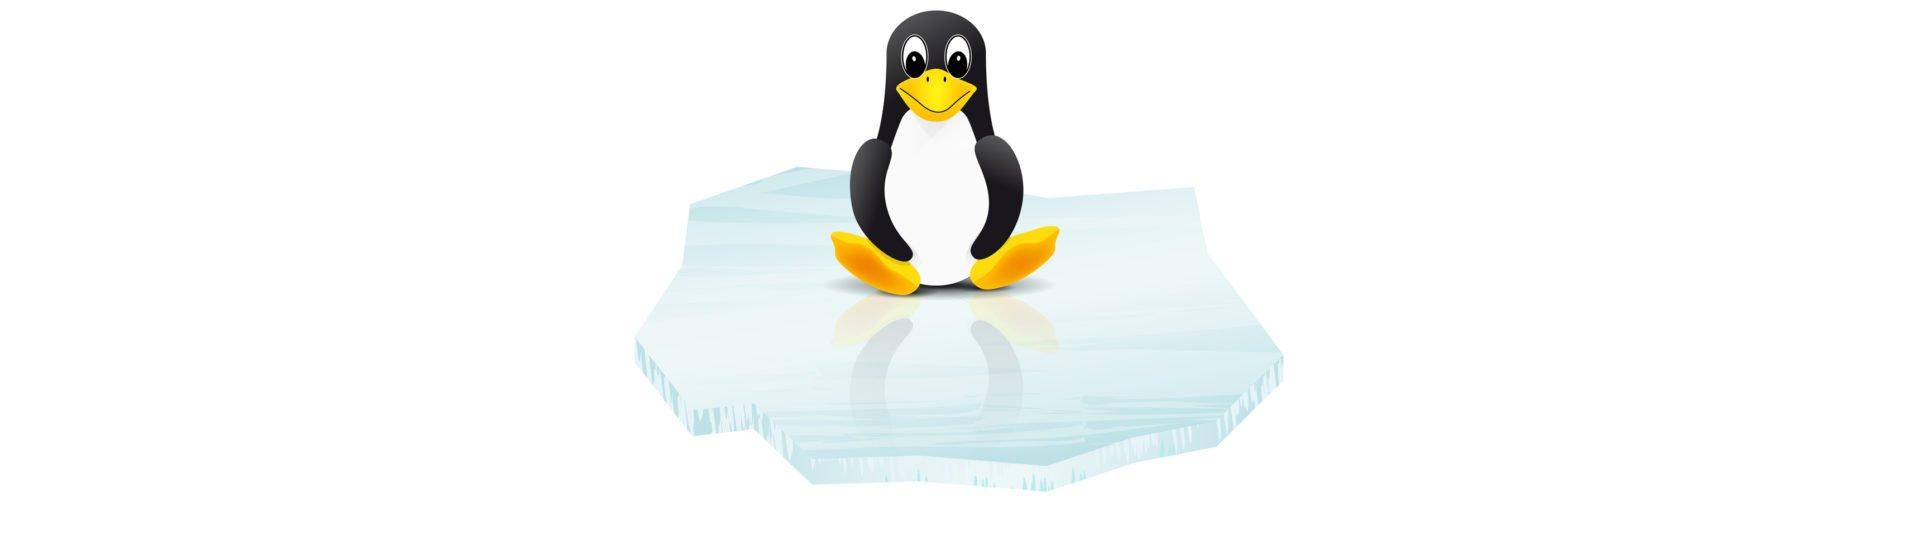 Permisos Linux